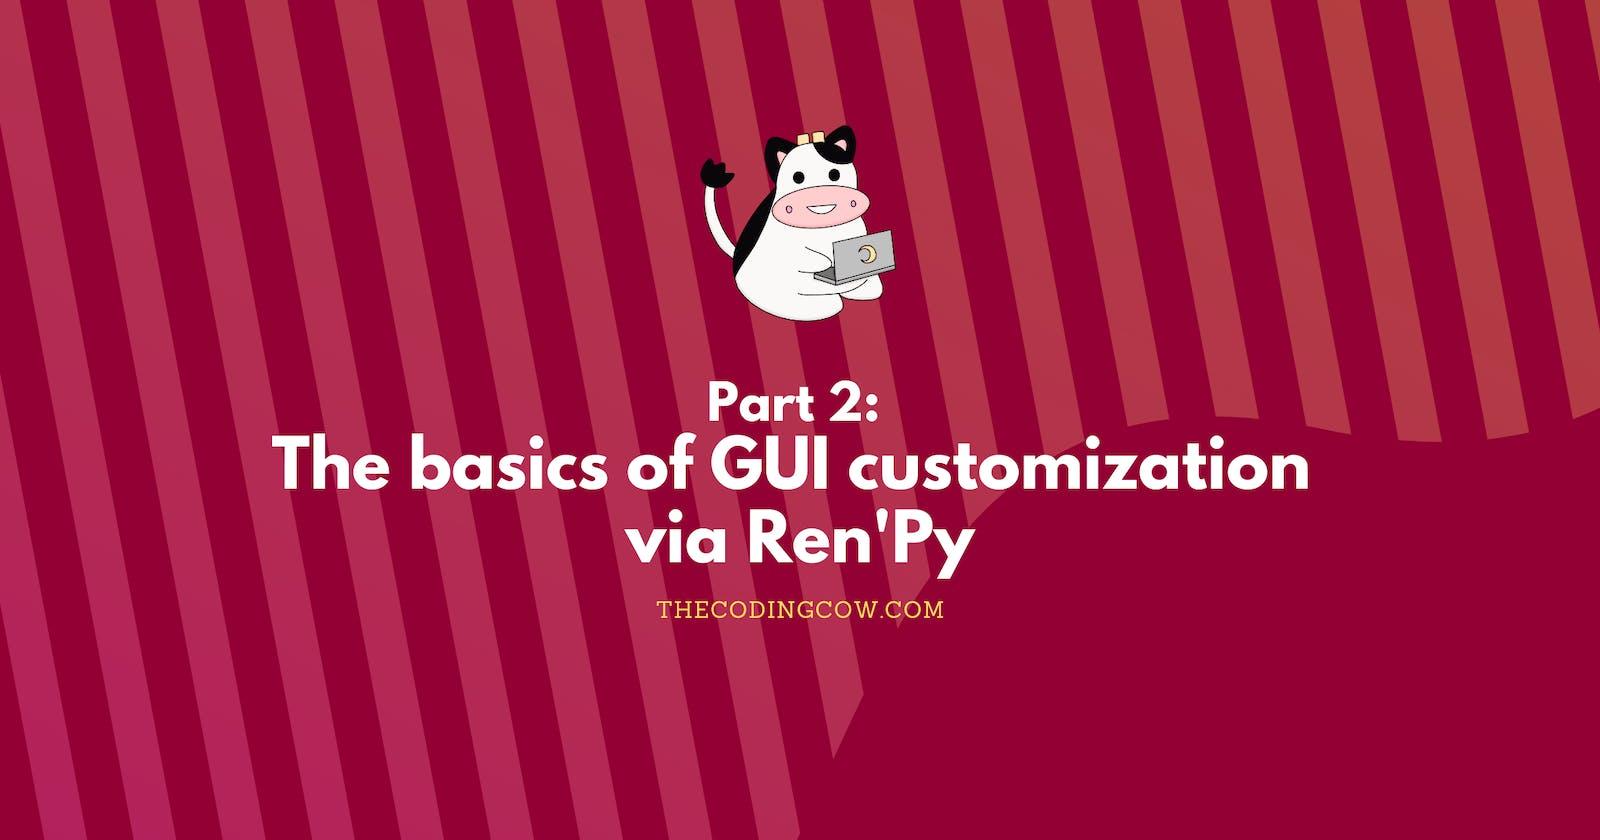 The basics of GUI customization via Ren'Py